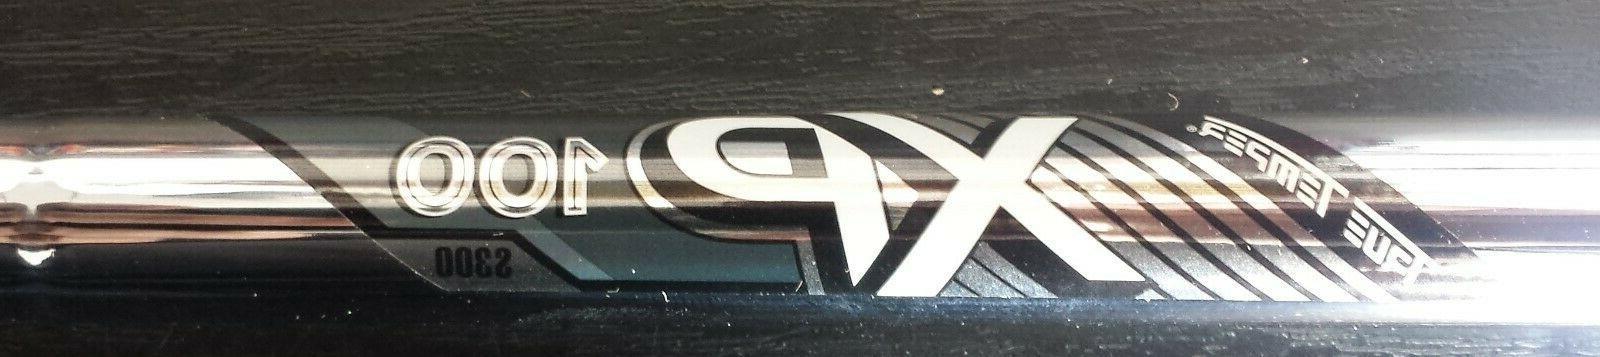 New Taylormade M5 Irons 4-PW+AW True Temper Stiff RH